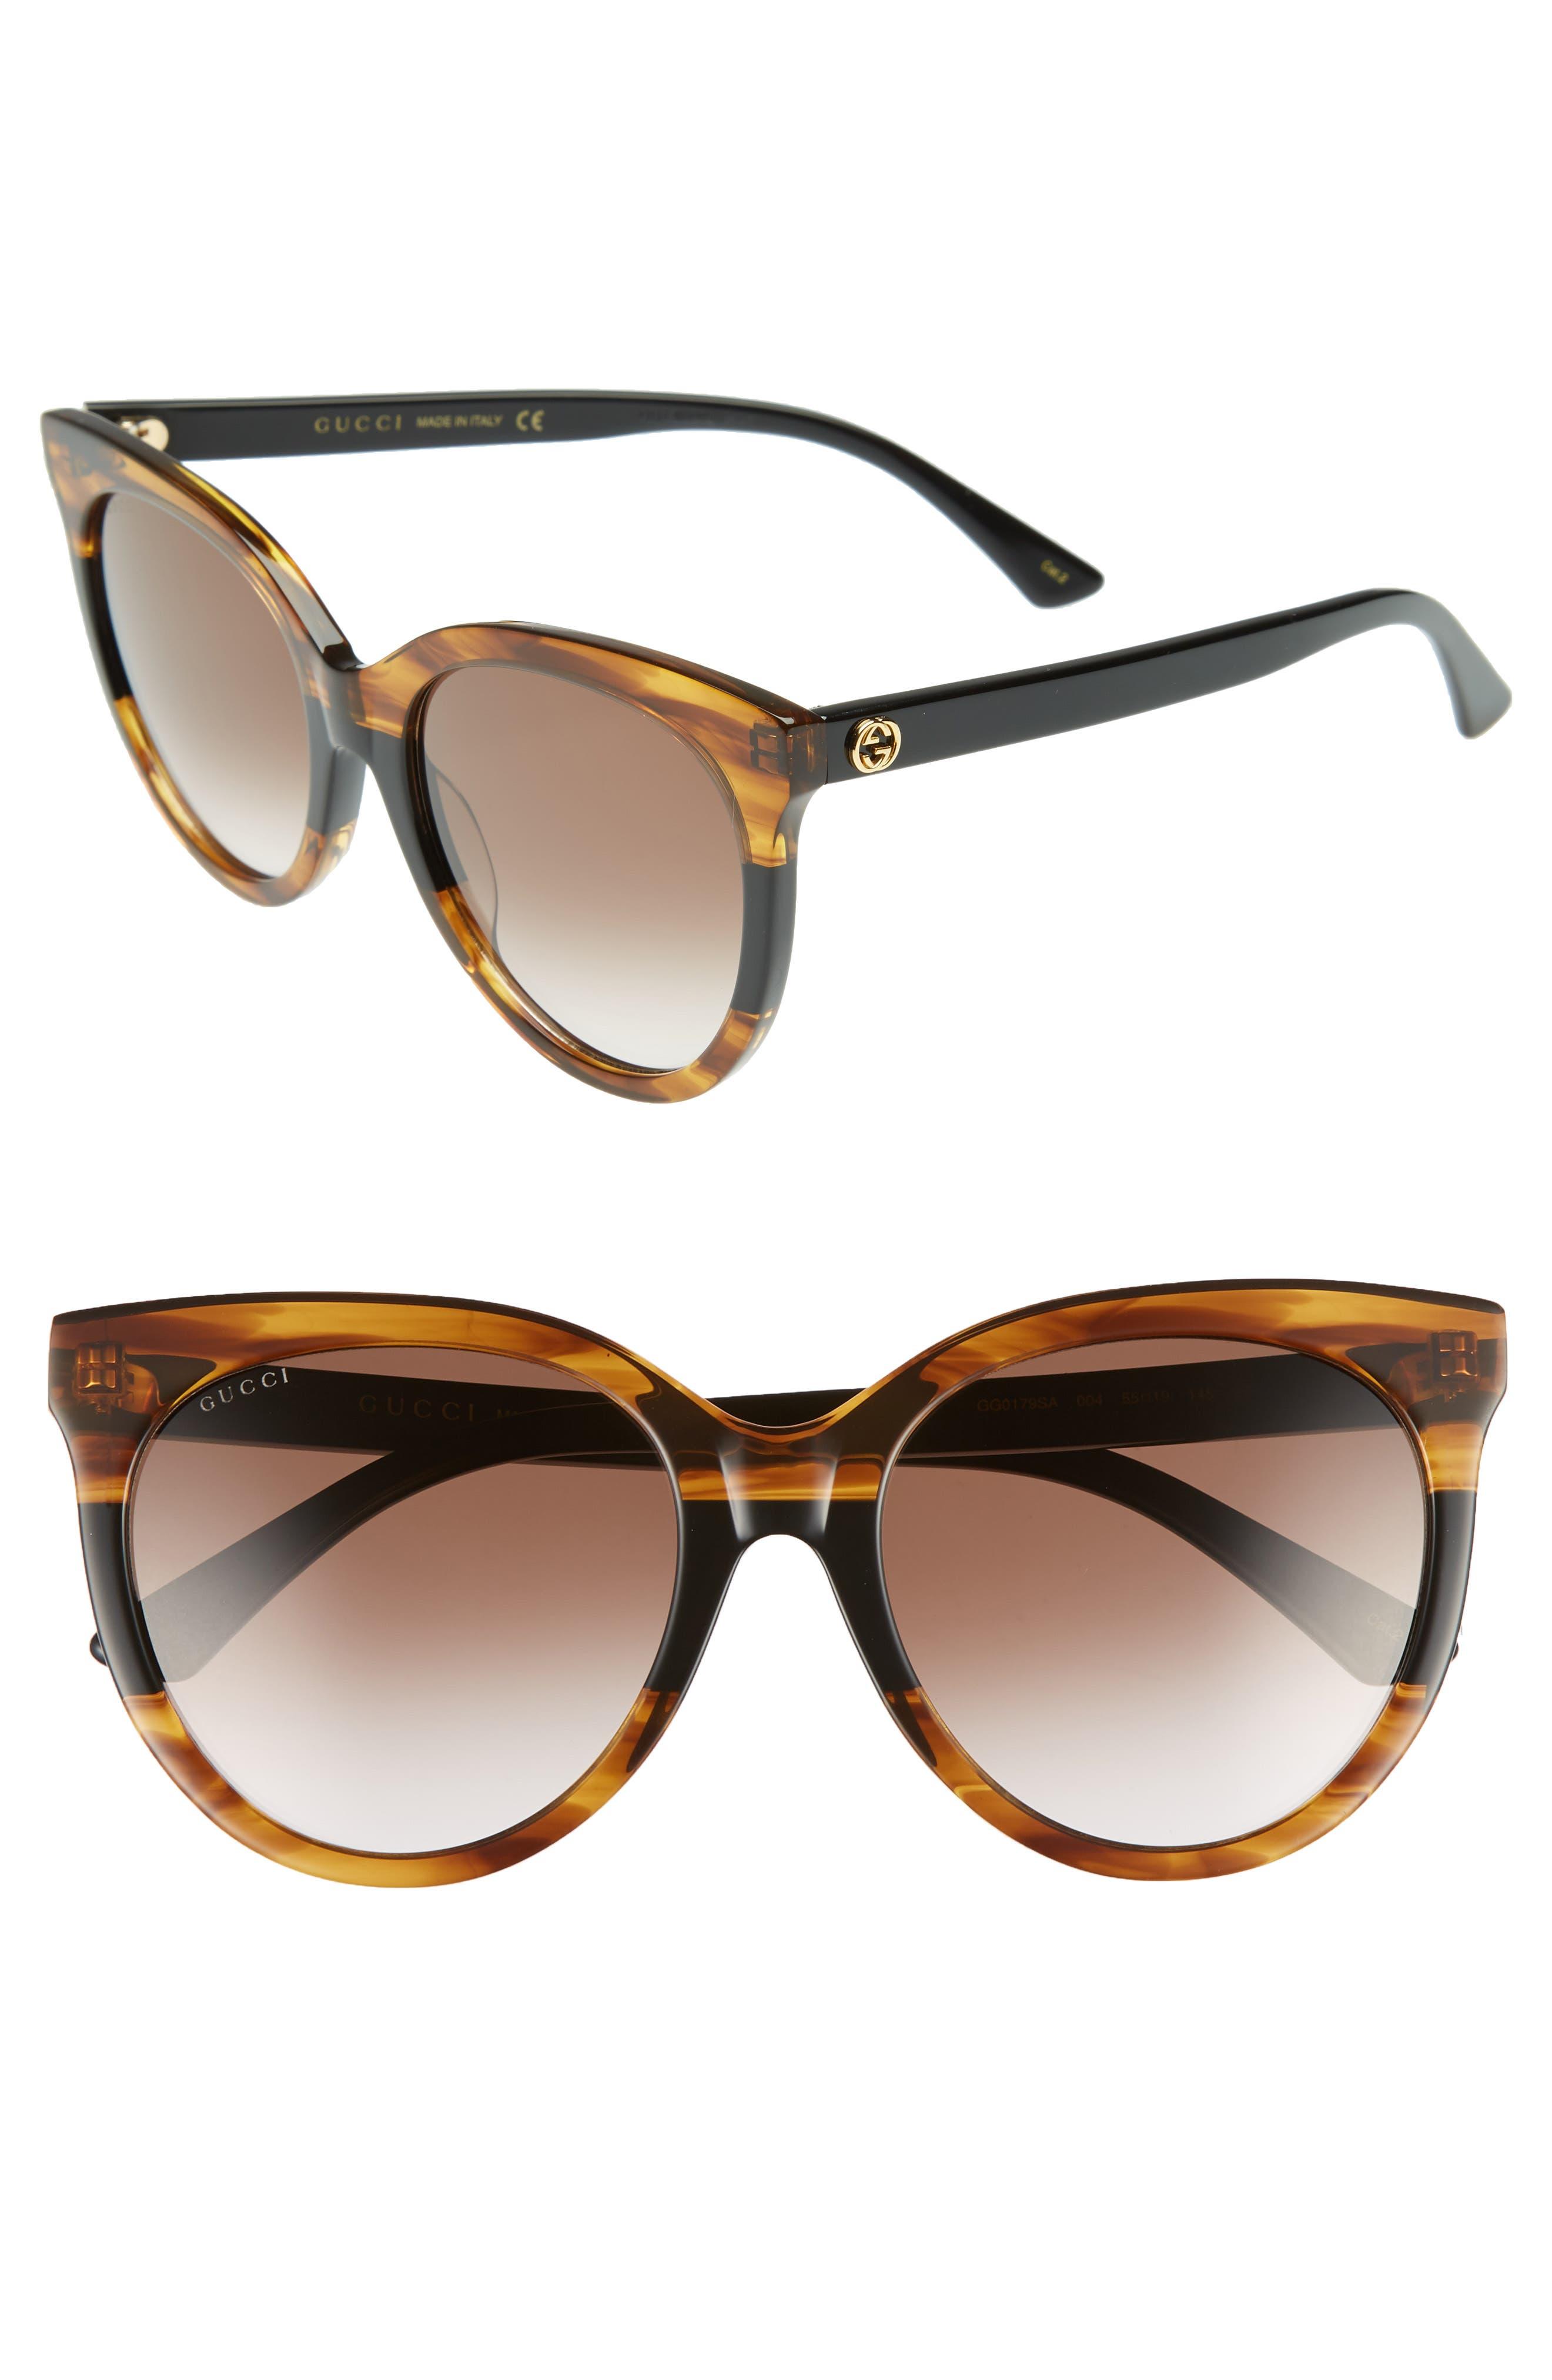 GUCCI,                             55mm Round Sunglasses,                             Main thumbnail 1, color,                             213